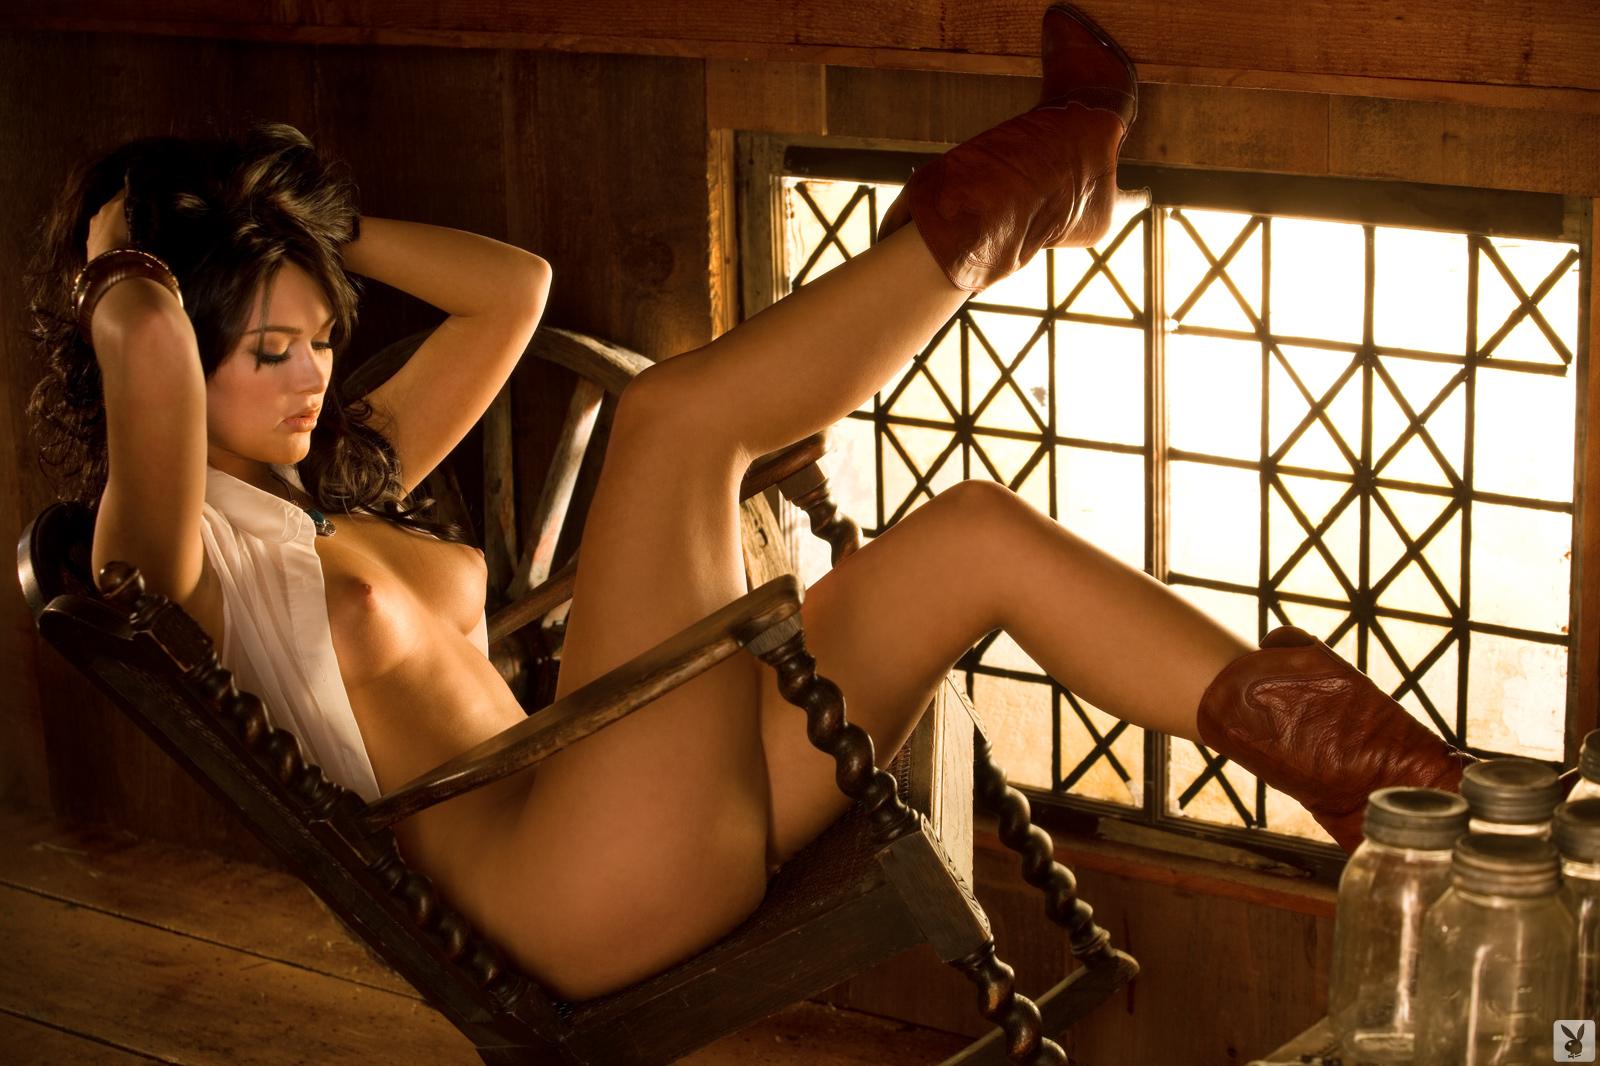 rainy-day-jordan-barn-naked-cowgirl-ranch-playboy-17